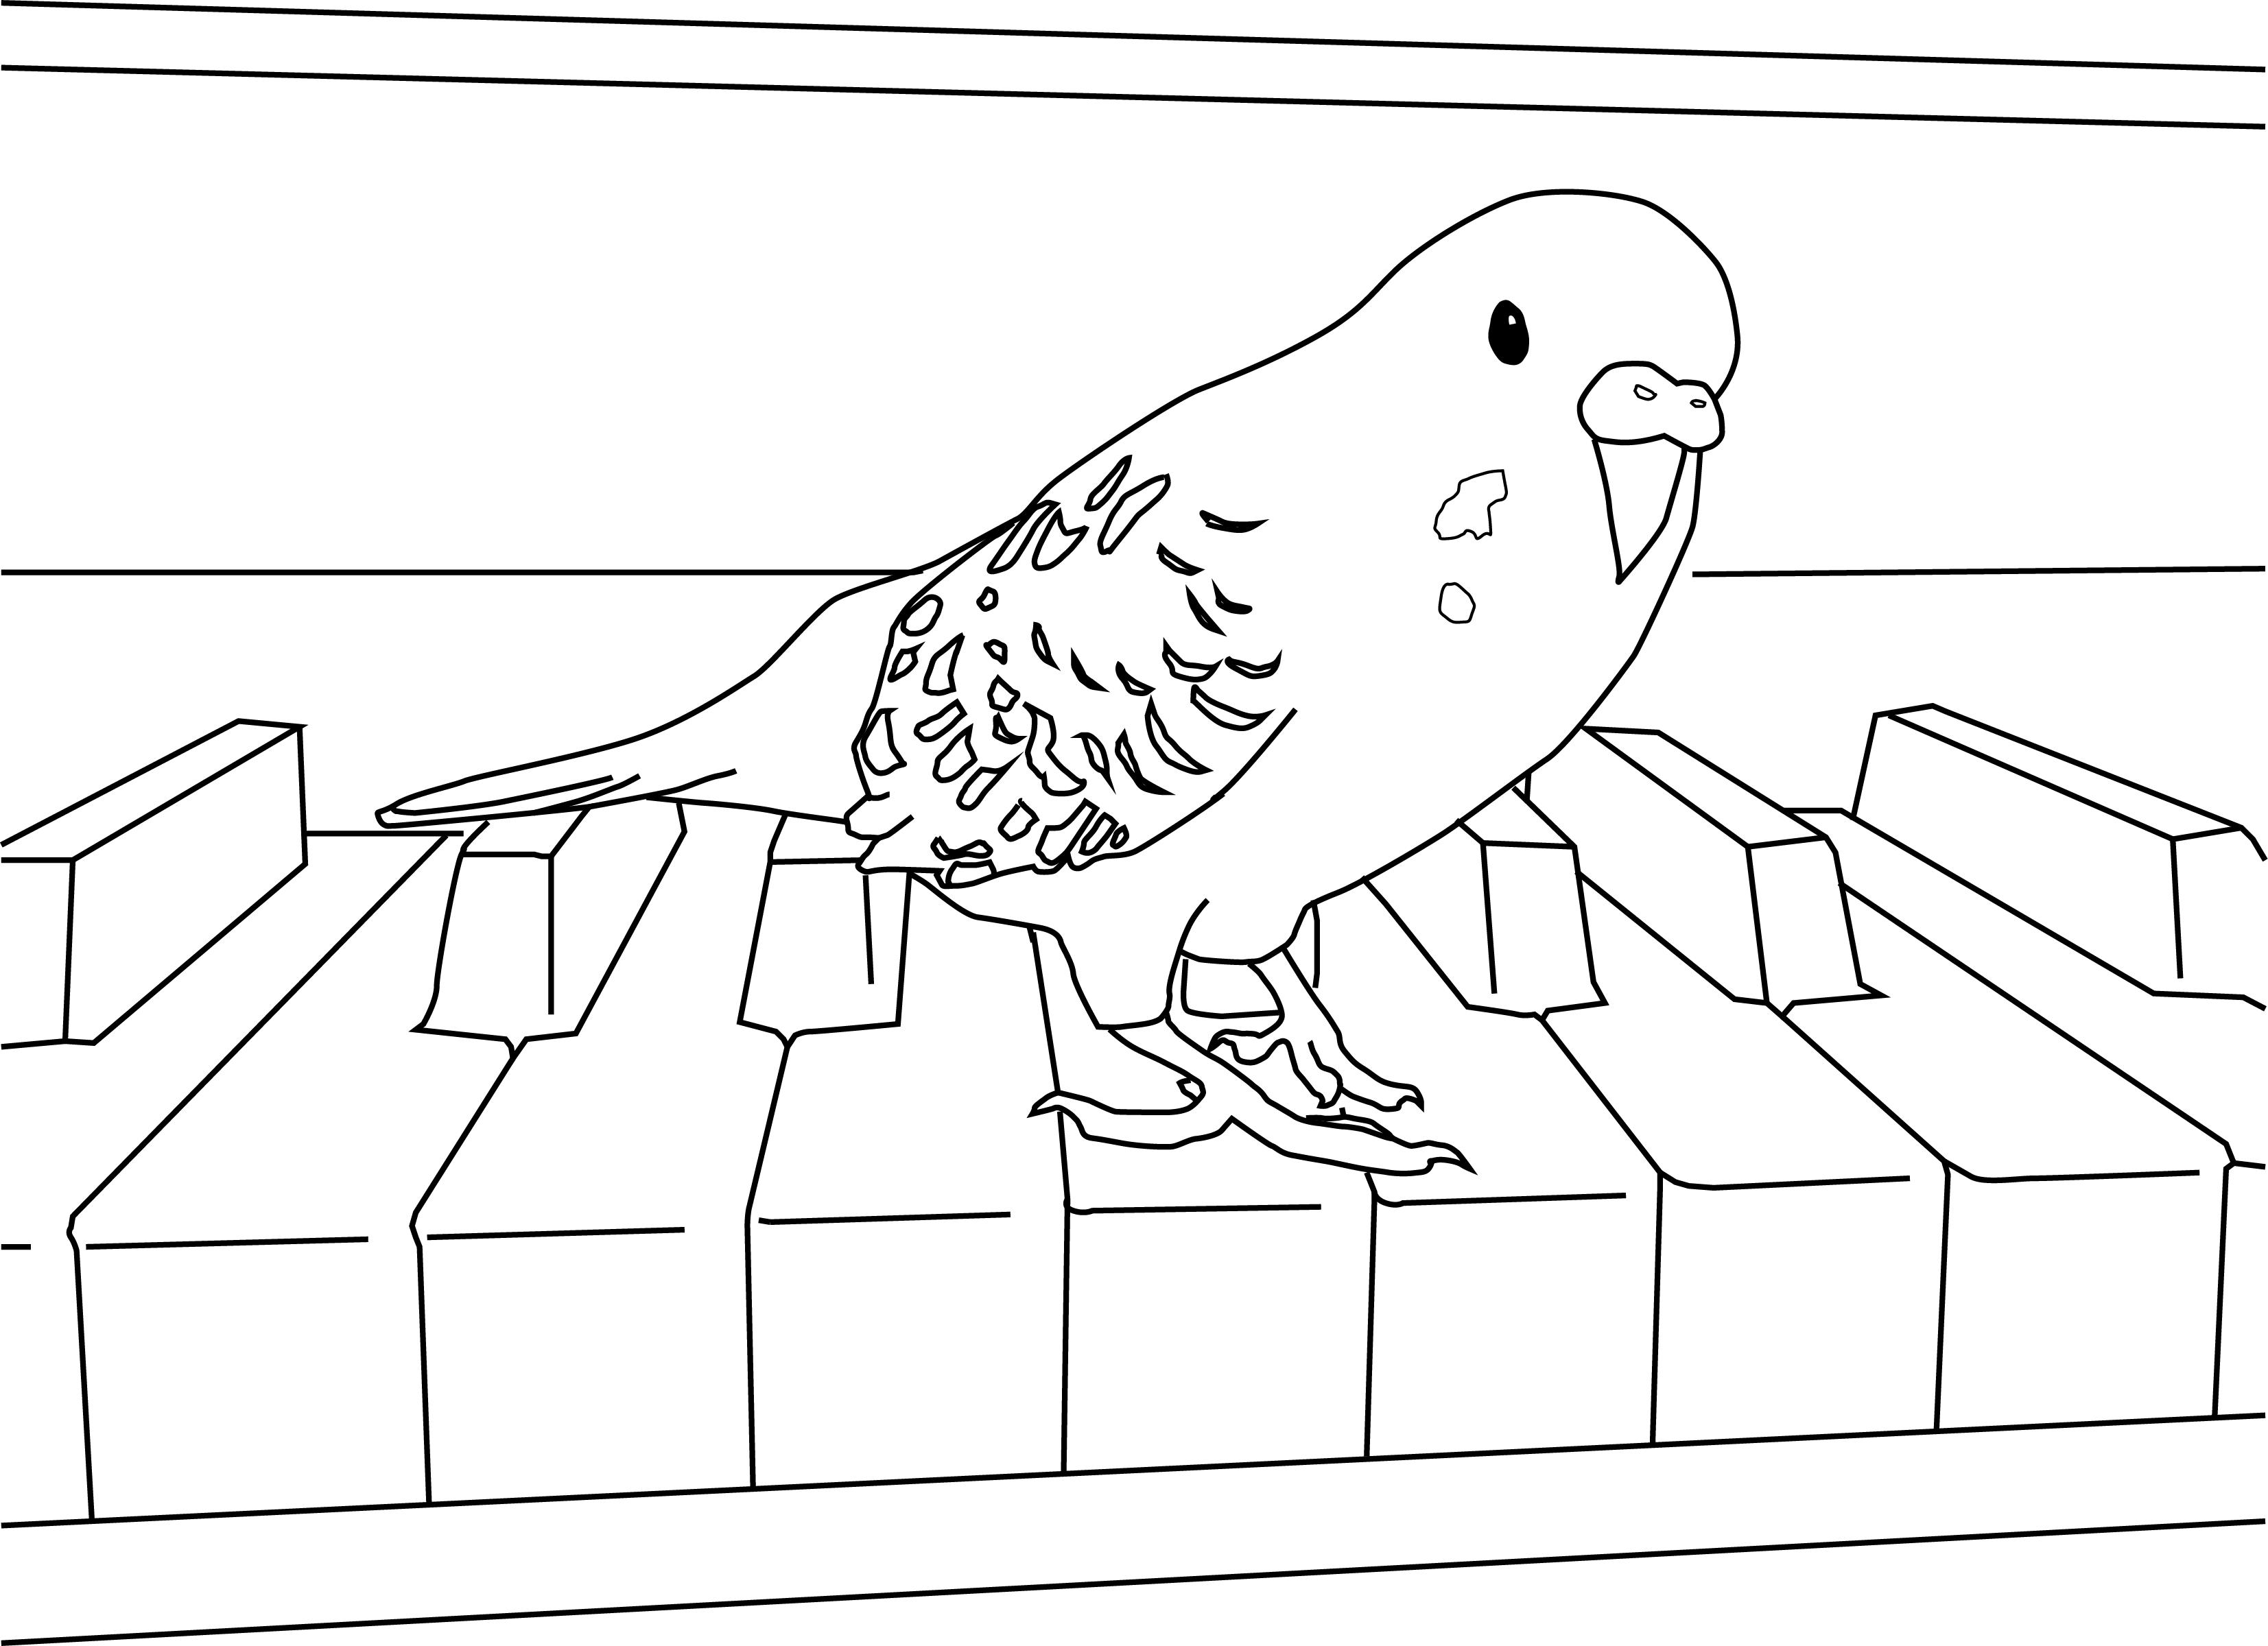 Parakeet Coloring Pages | Parakeet | Pinterest | Parakeets and Budgies